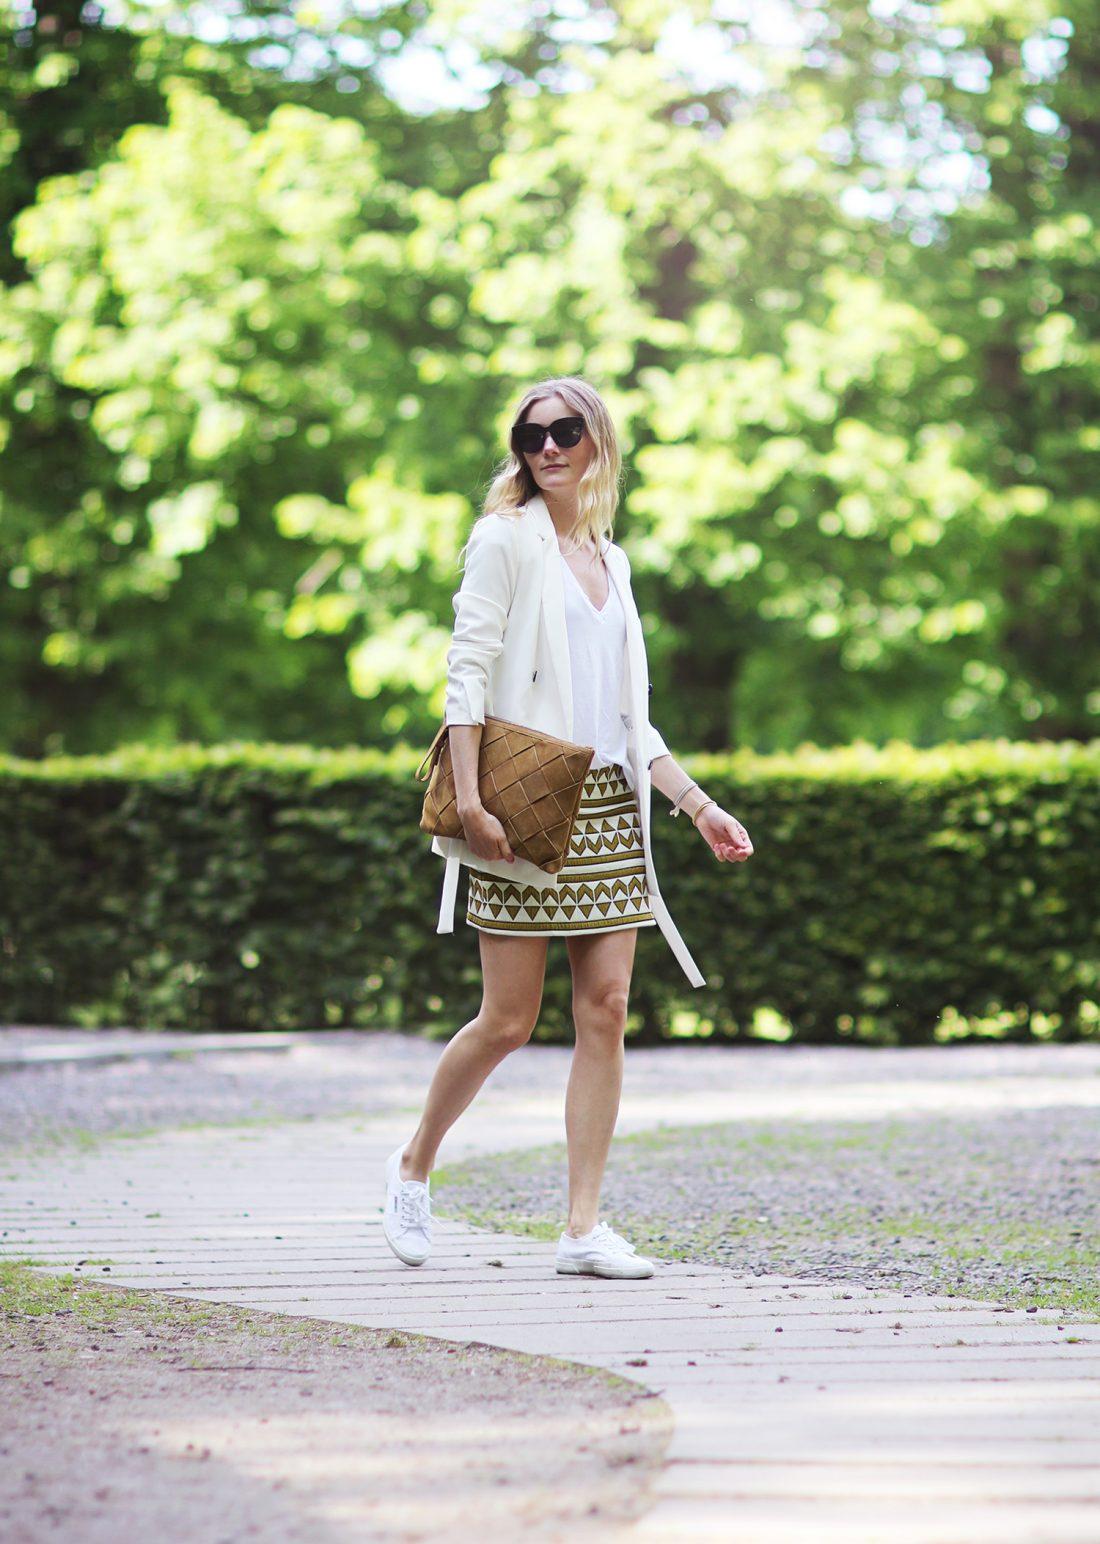 modeblog-nederdel-fashion-blog@2x.jpg